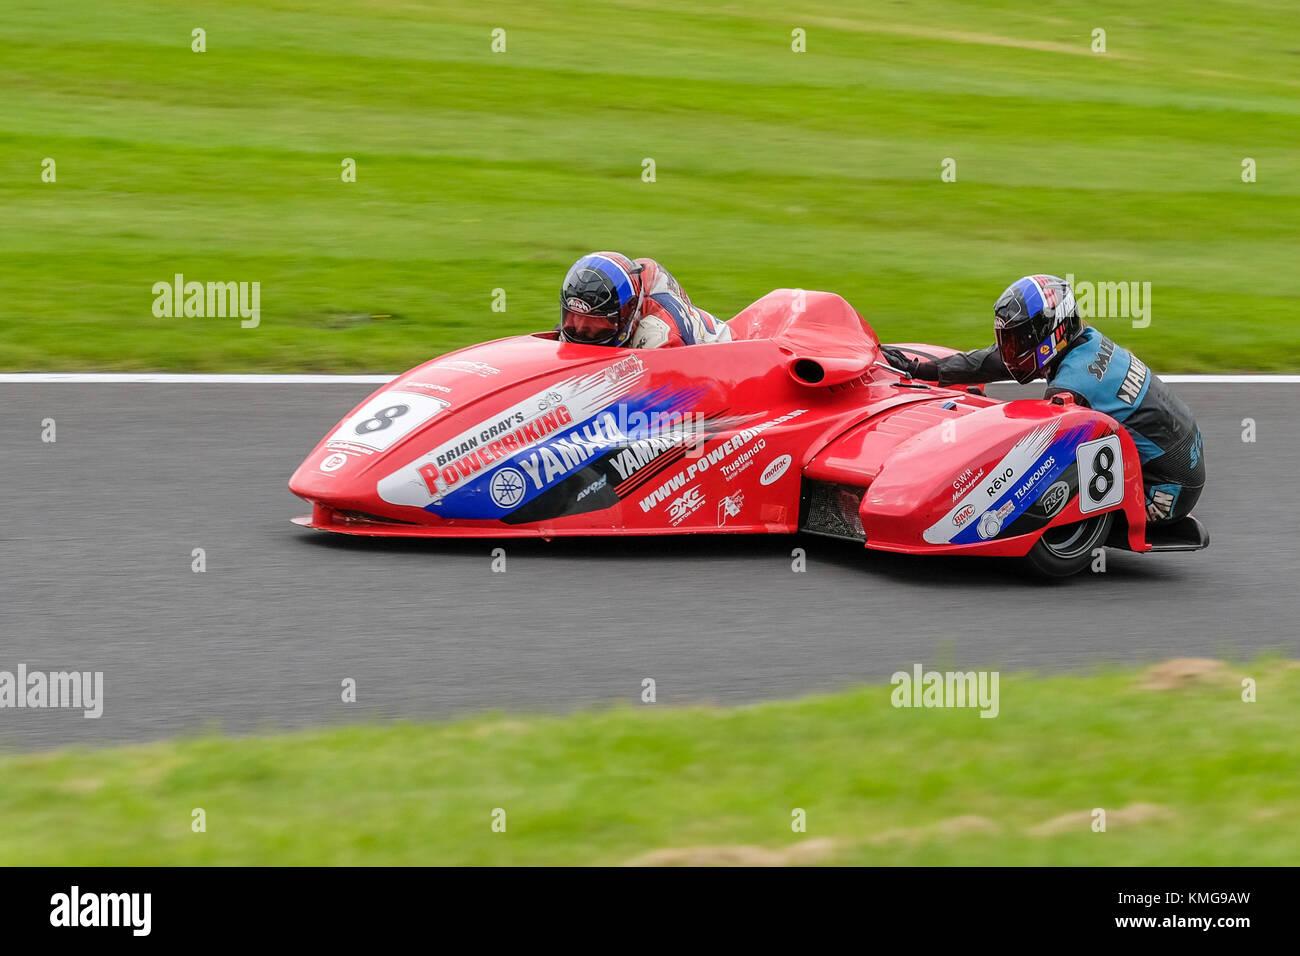 Hyundai British Sidecar Championship, Cadwell 2017 - Stock Image